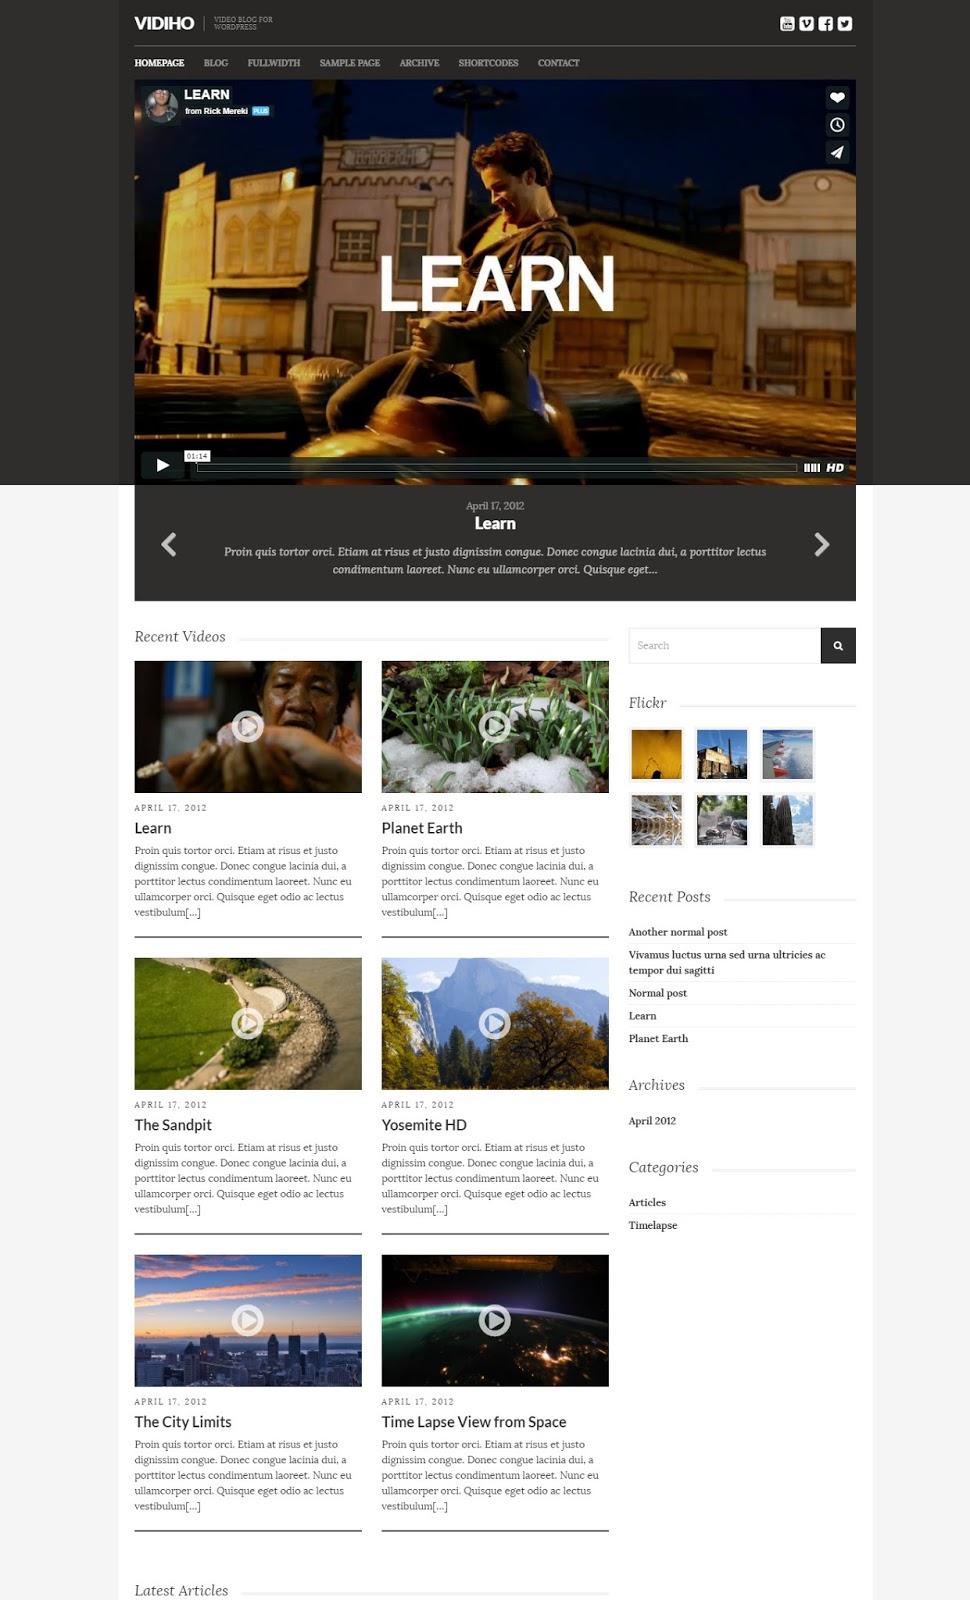 Vidiho-wordpress video Blogging Theme